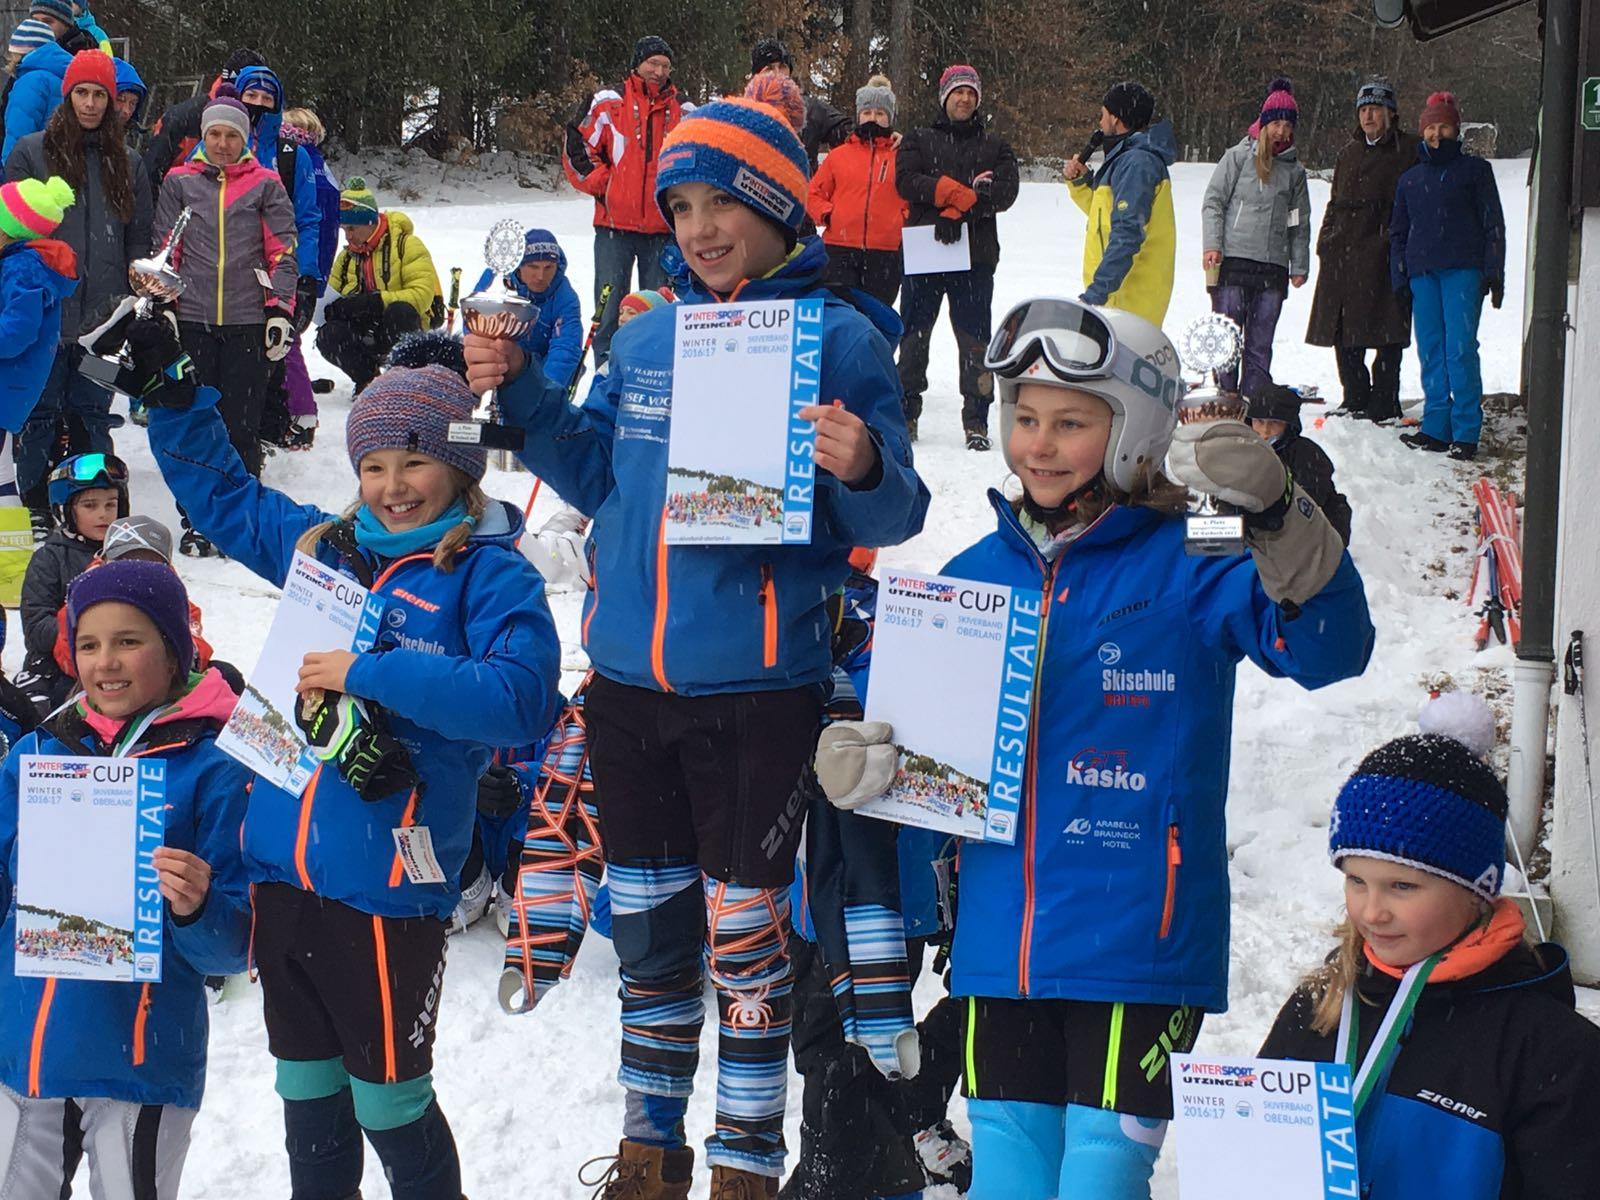 Ski_Alpin_jan17_1